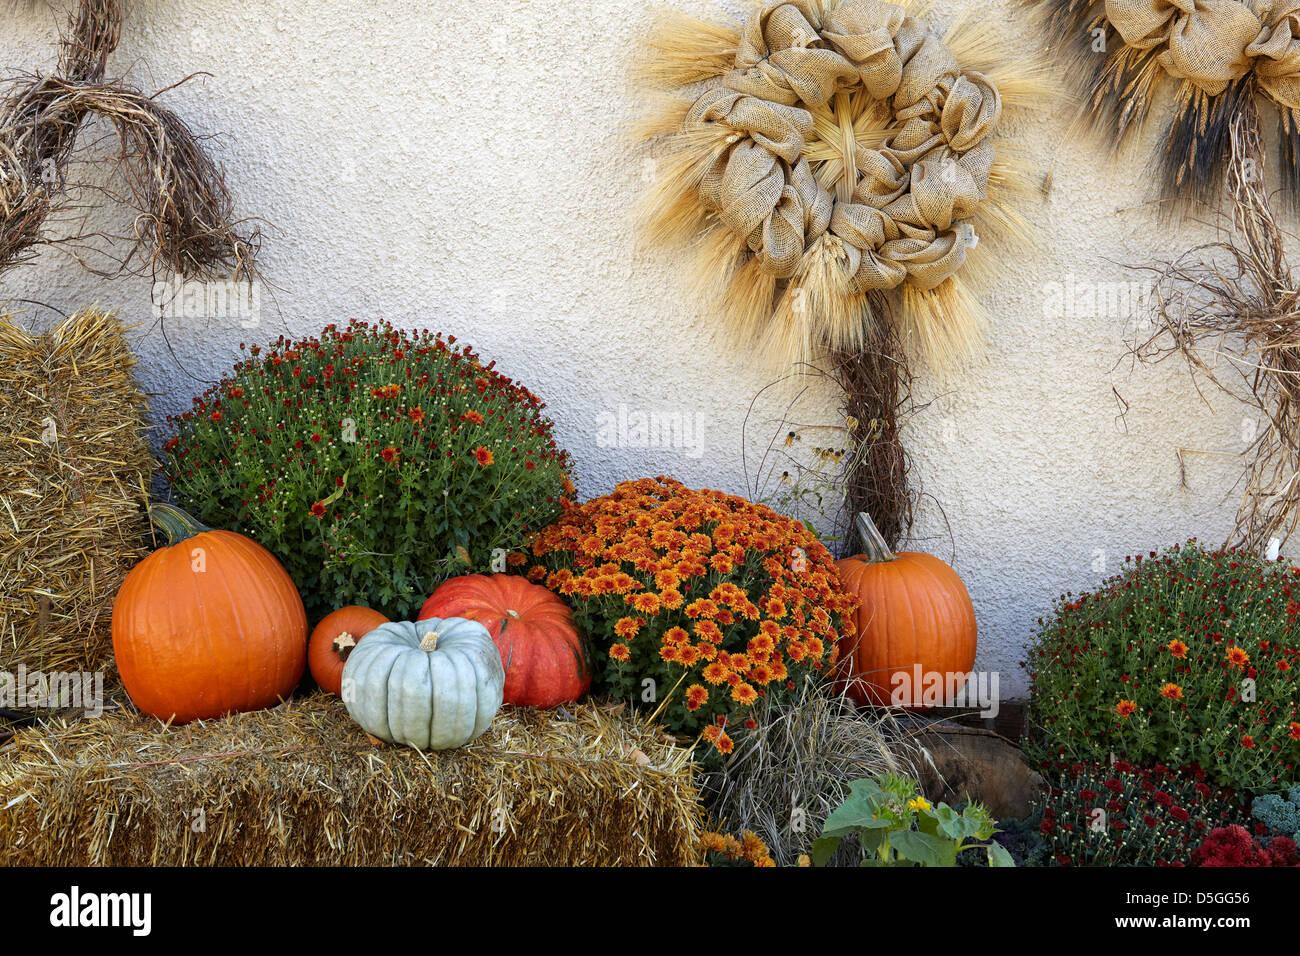 Autumn decorations - Stock Image